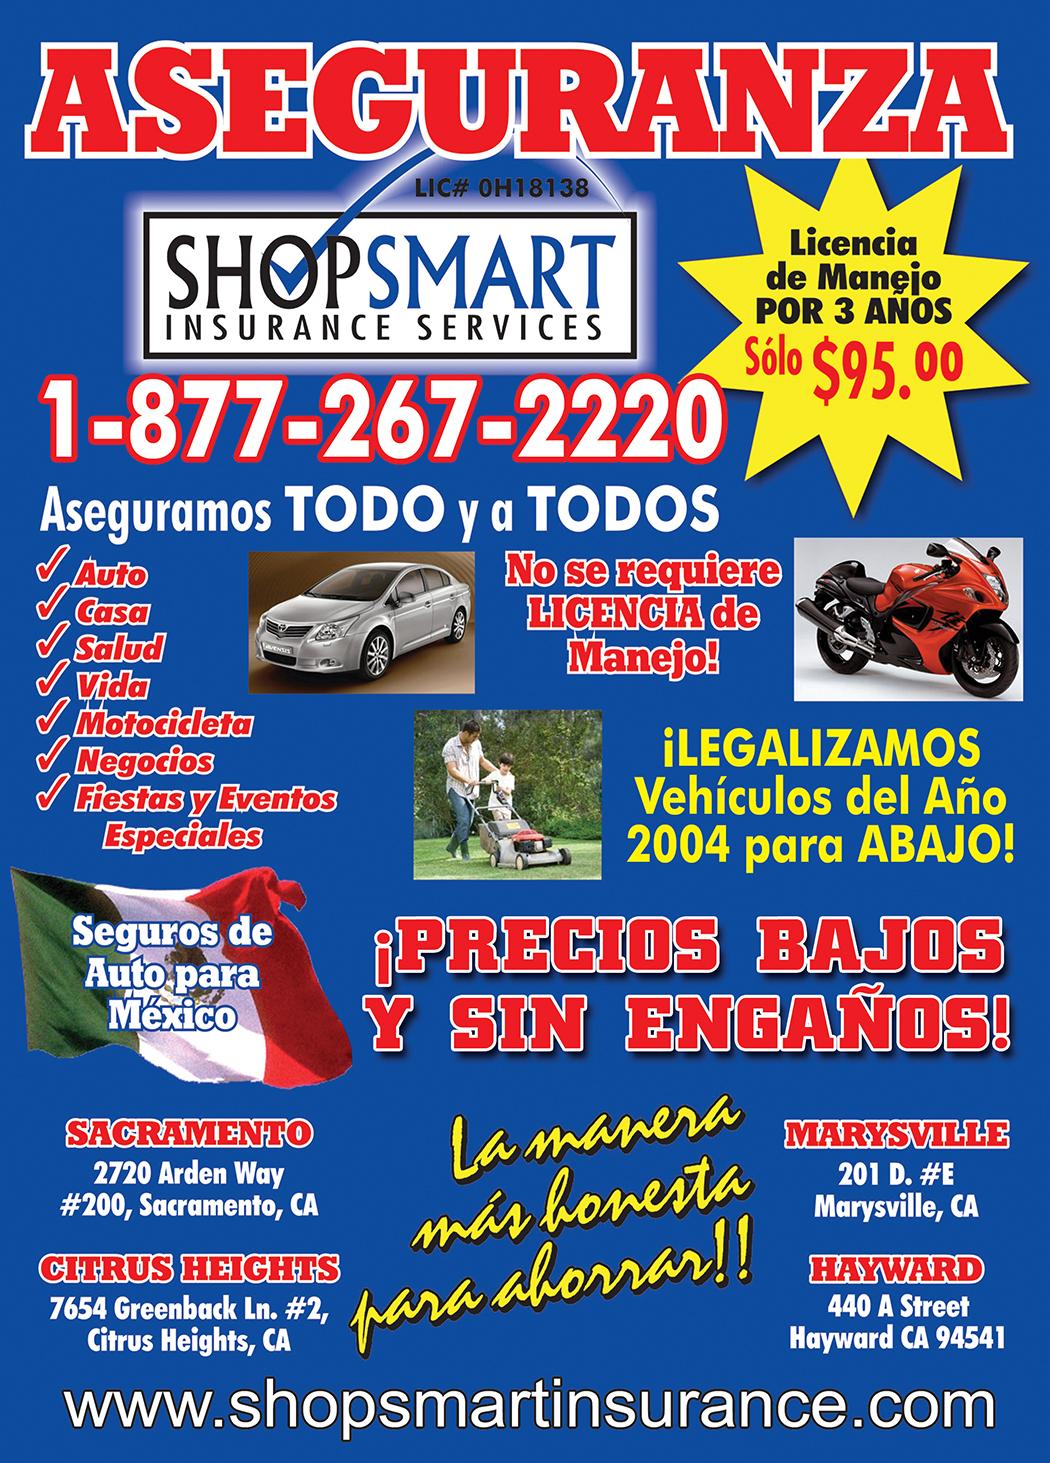 Shopsmart Insurance 1pag junio 2012.jpg